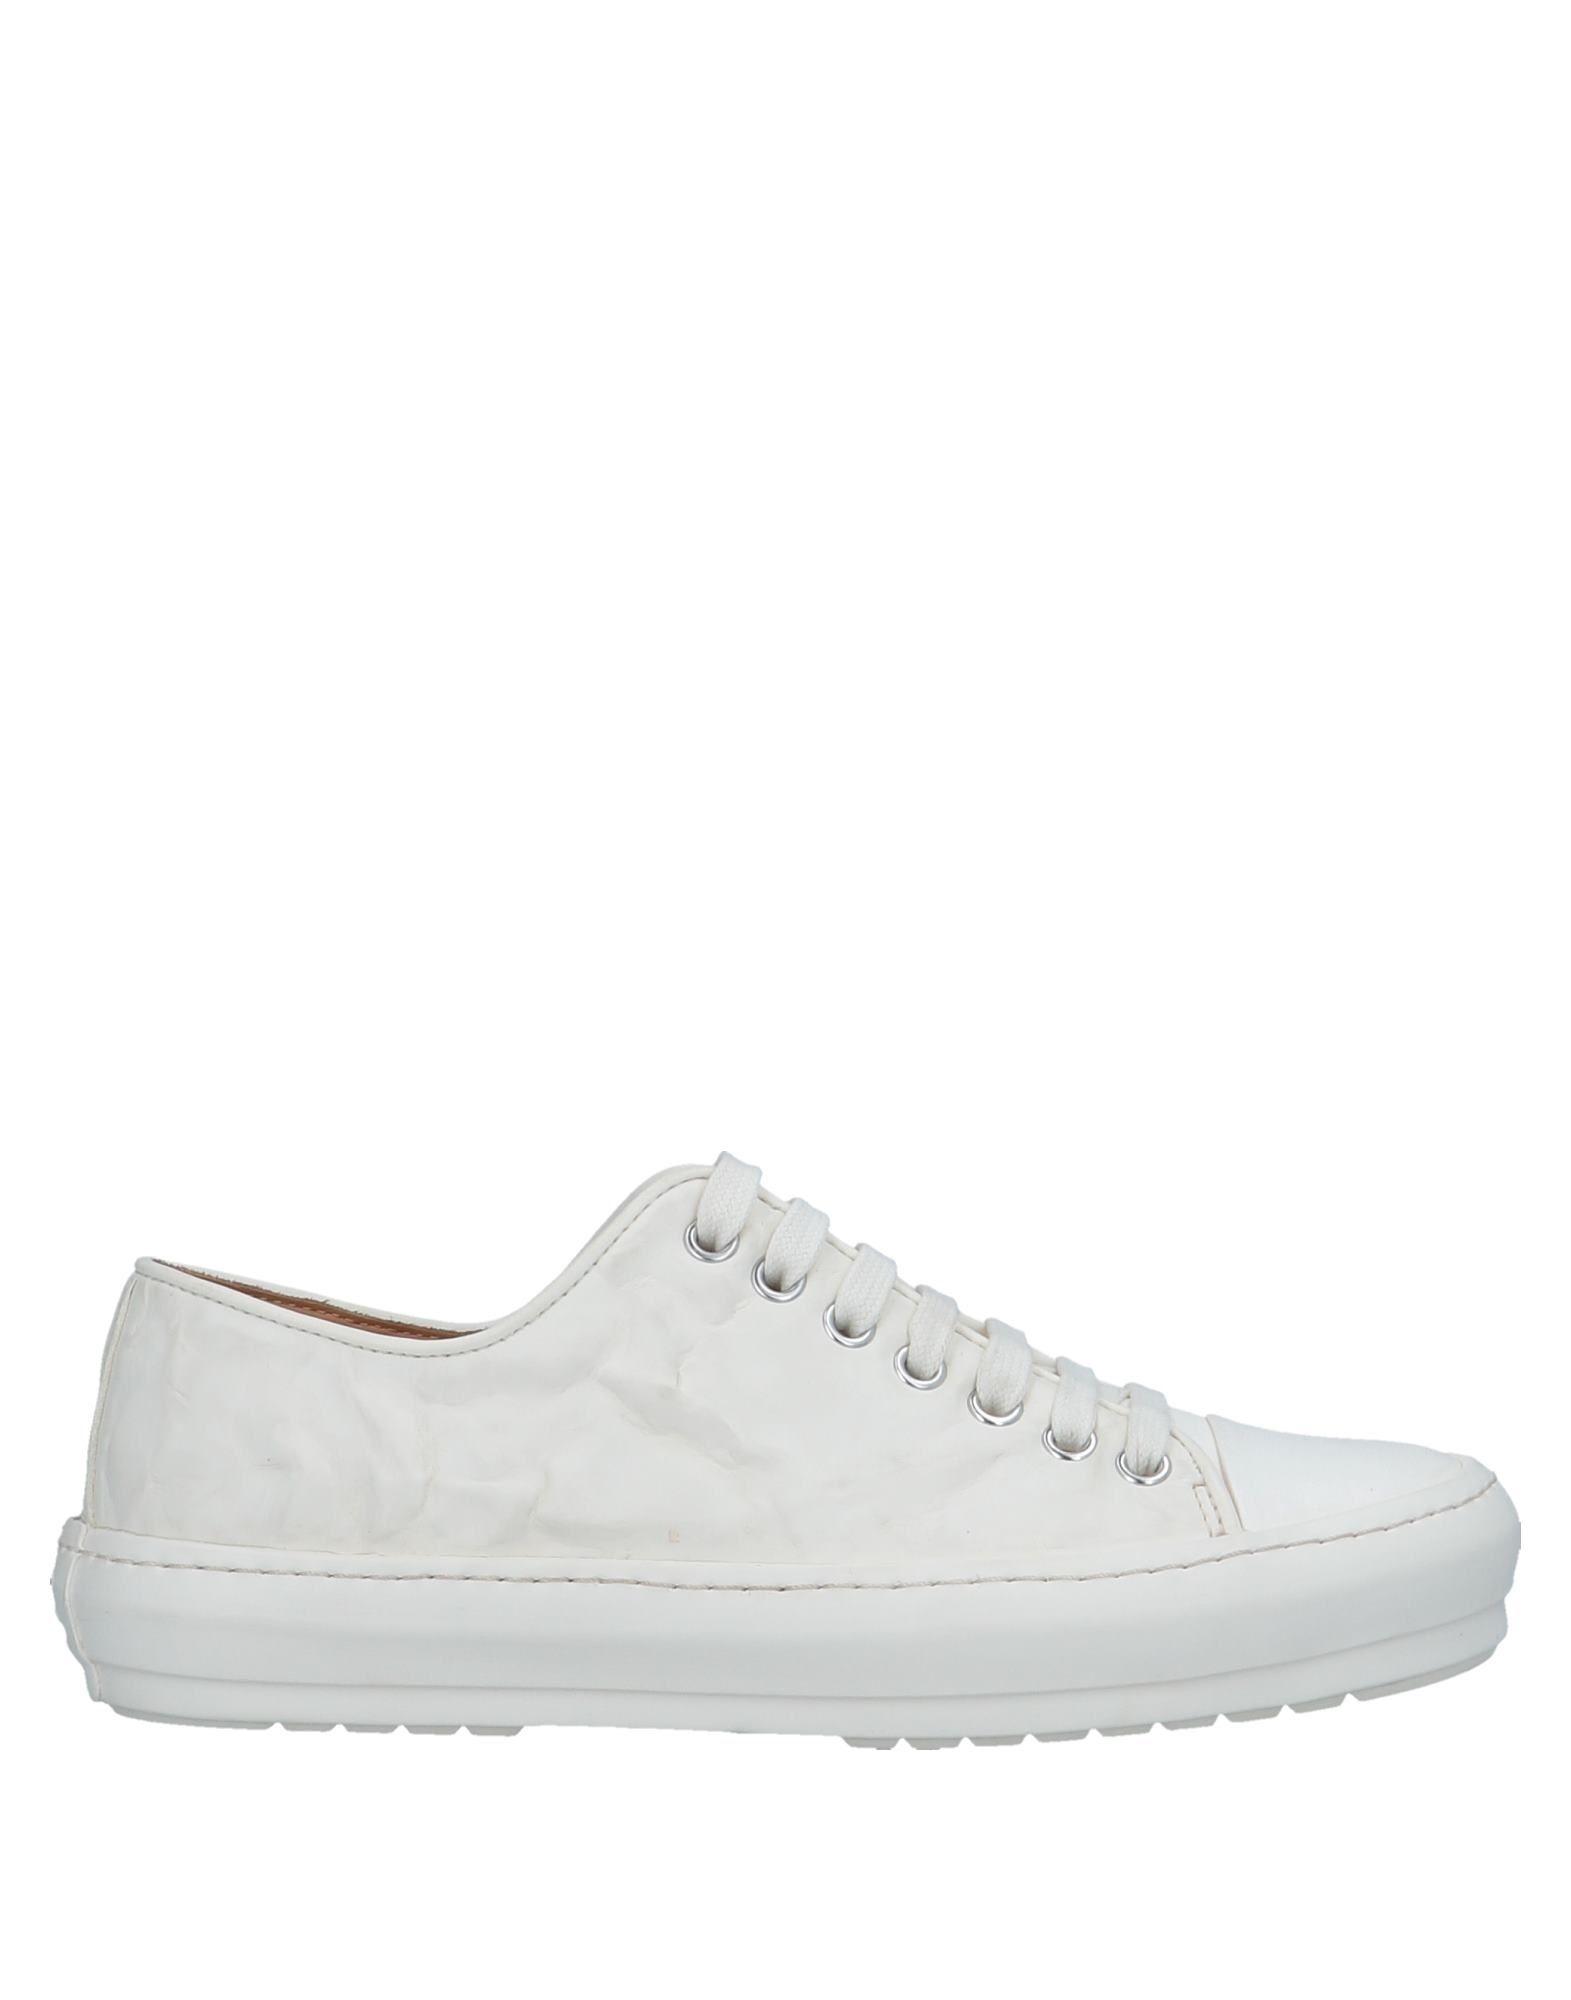 Moda Sneakers Both Uomo - 11541953FN